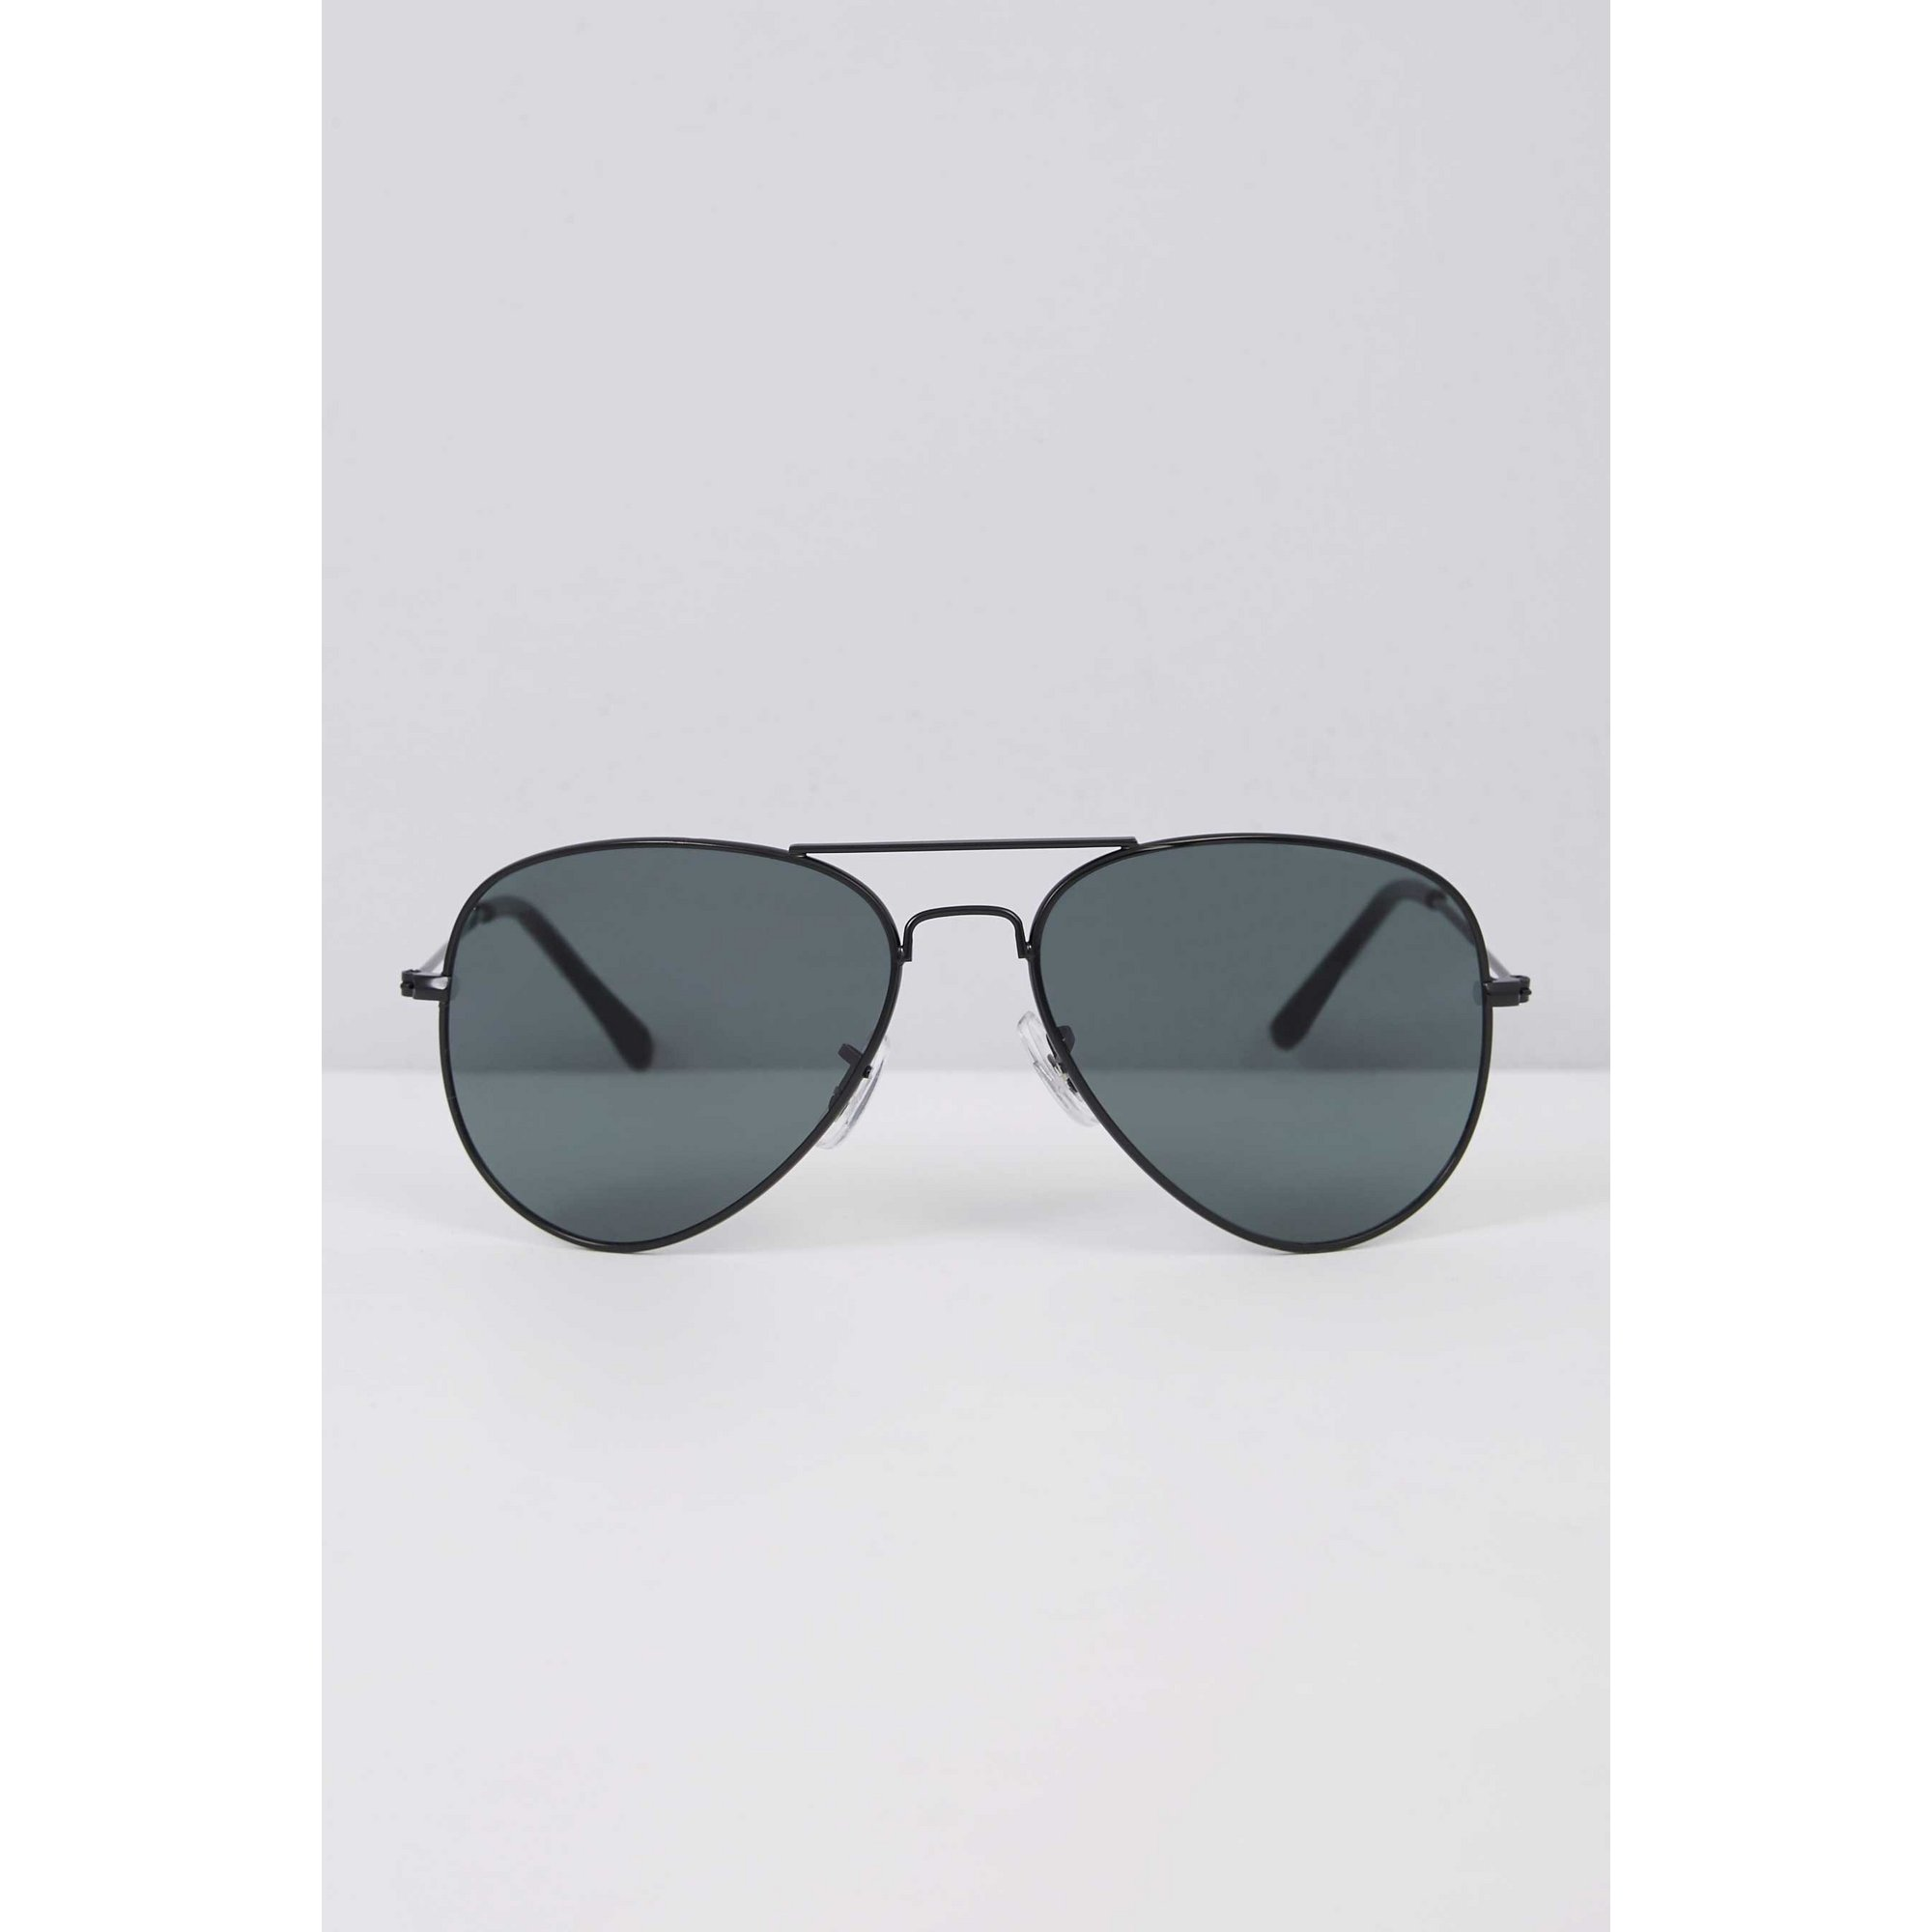 Image of Jack and Jones Aviator Sunglasses